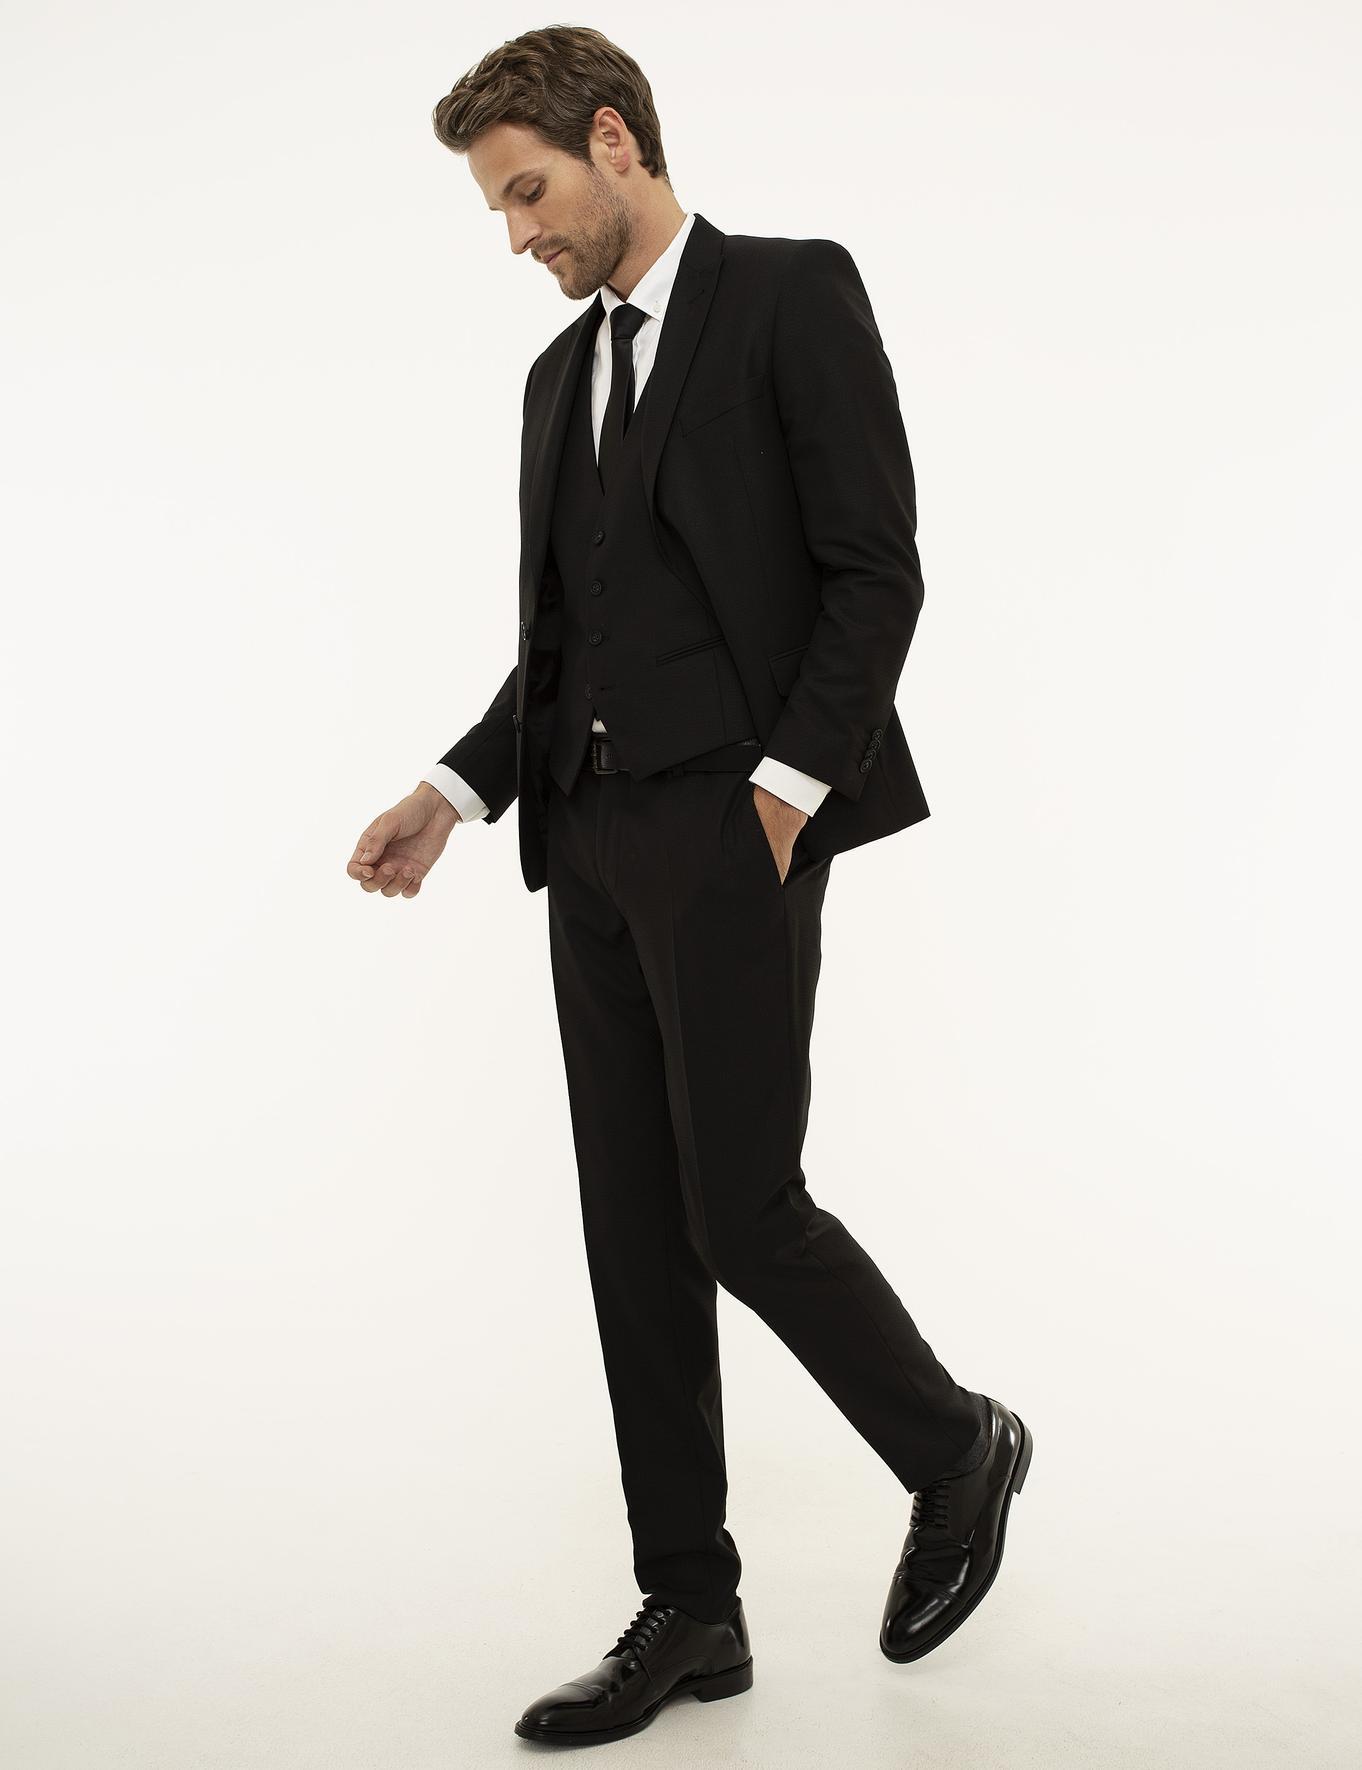 Siyah Ekstra Slim Fit Yelekli Takım Elbise